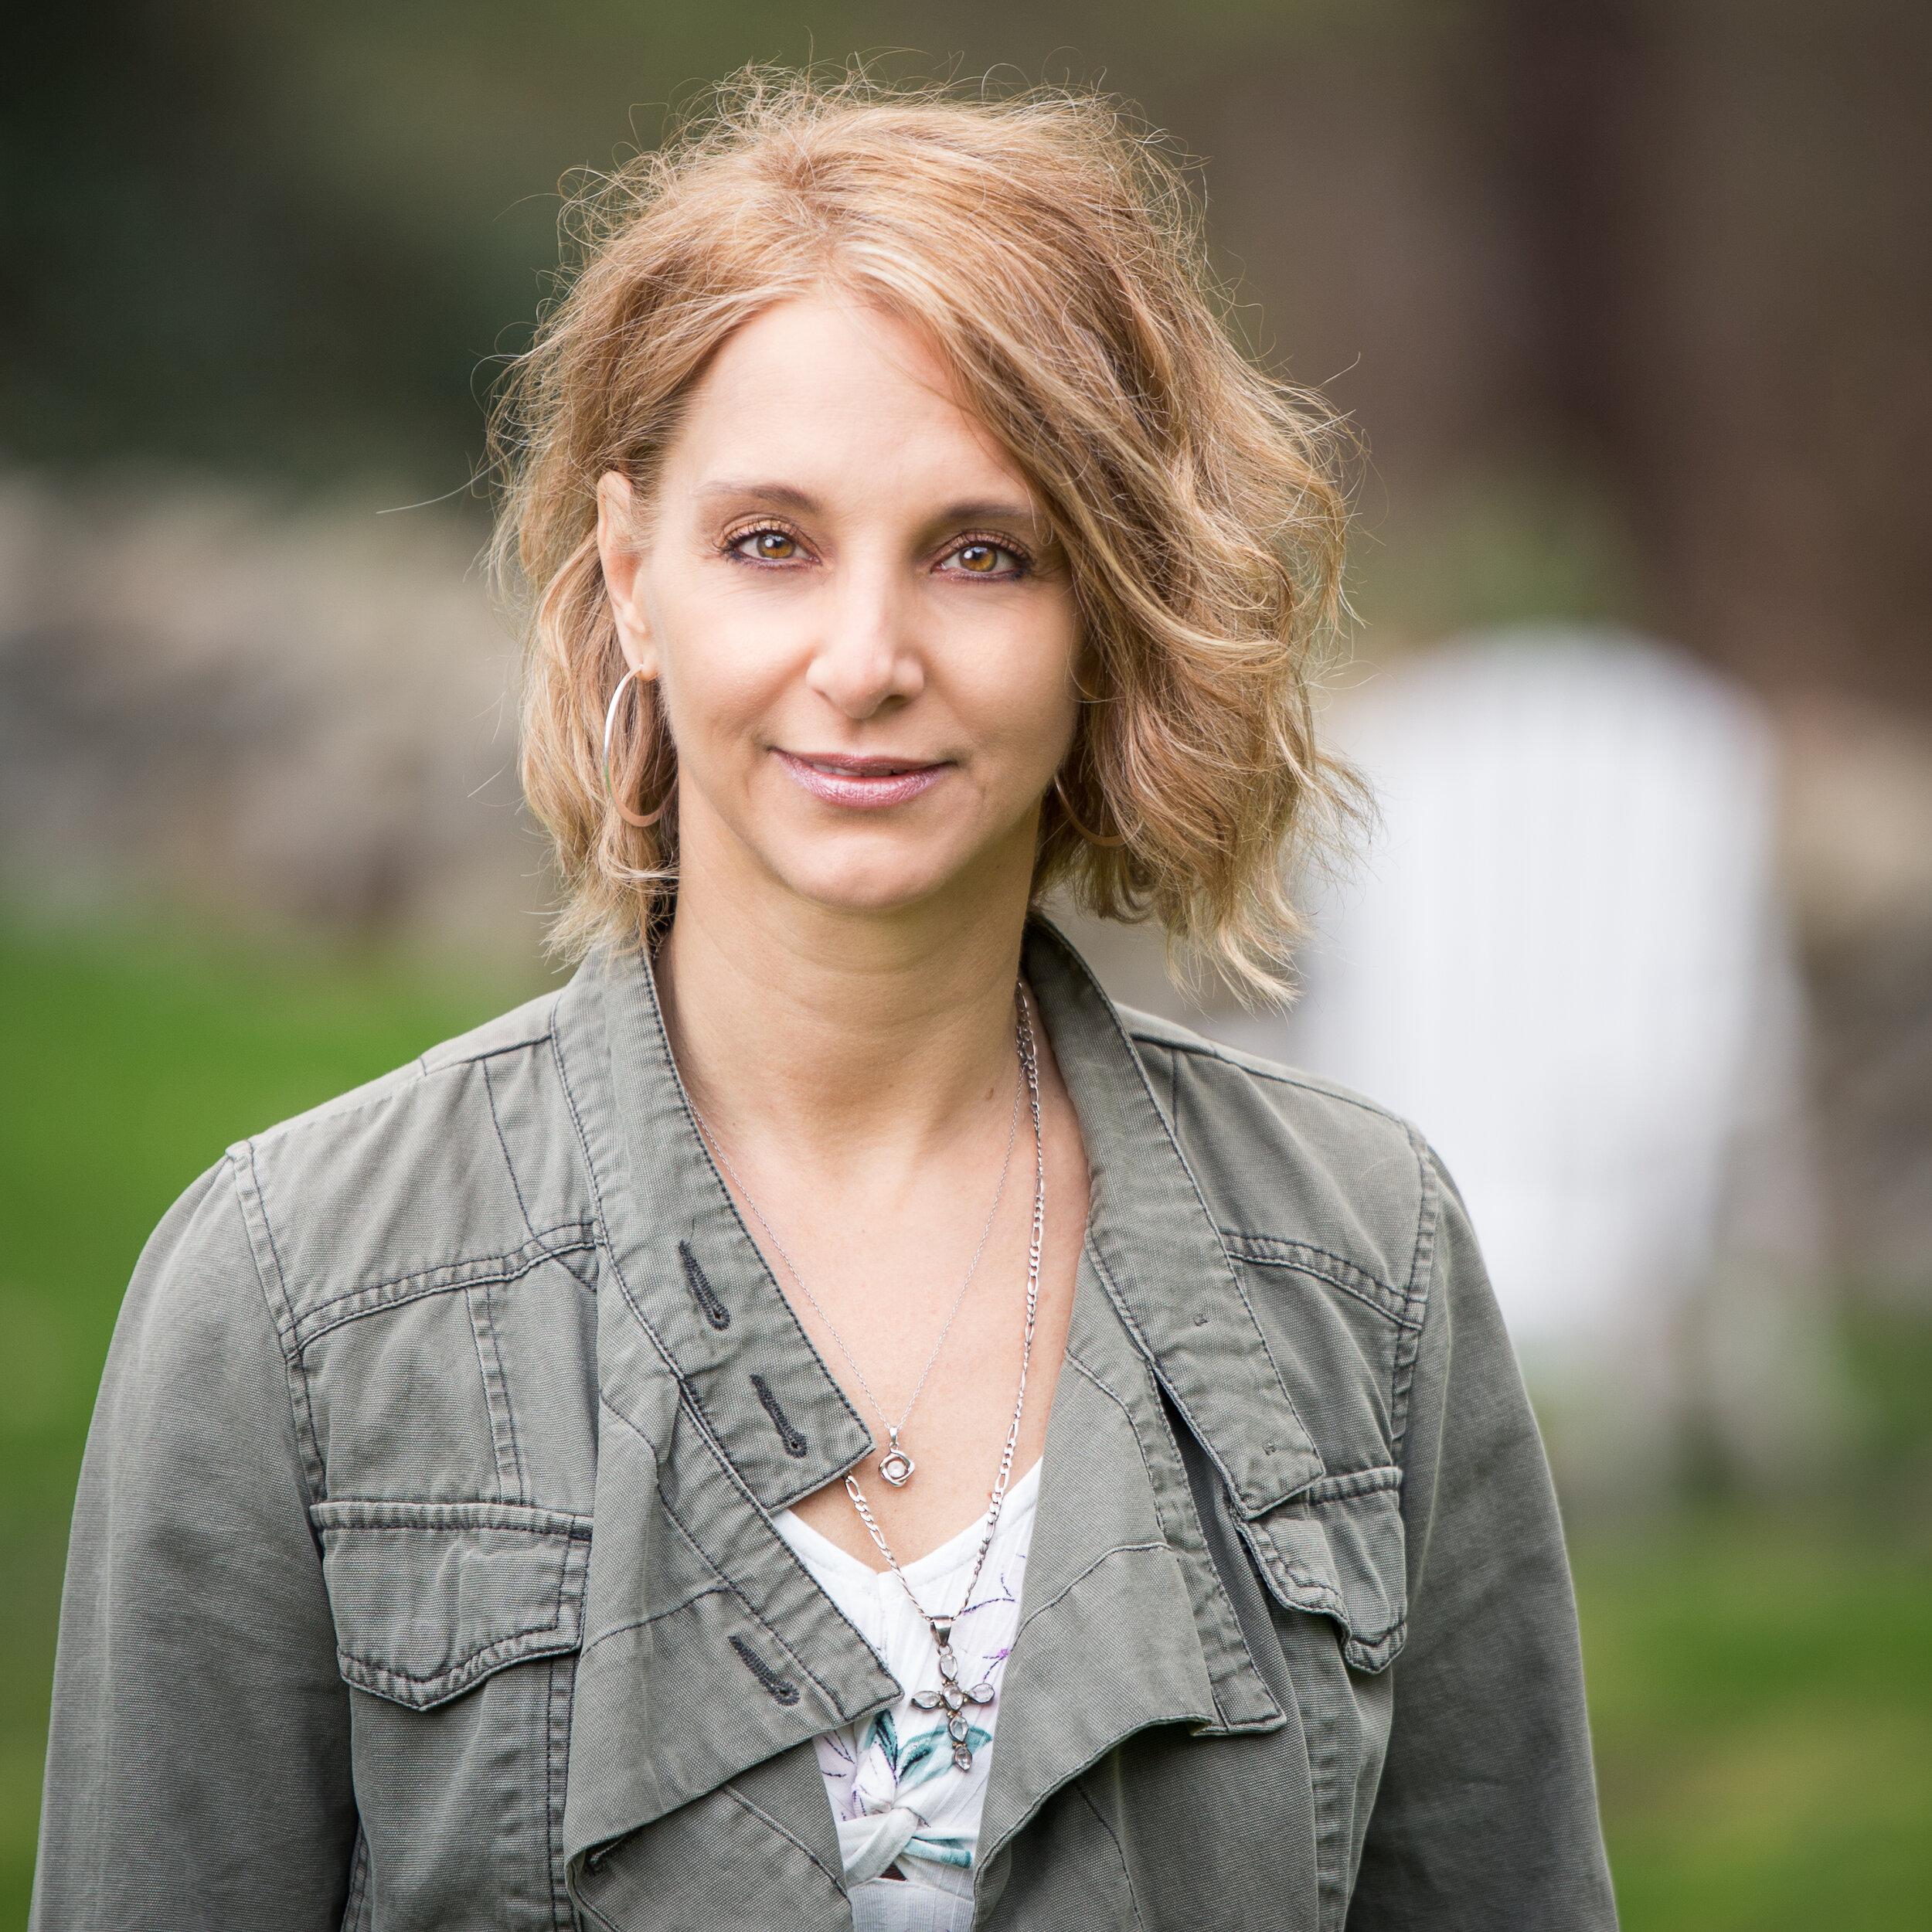 Author Sherianna Boyle